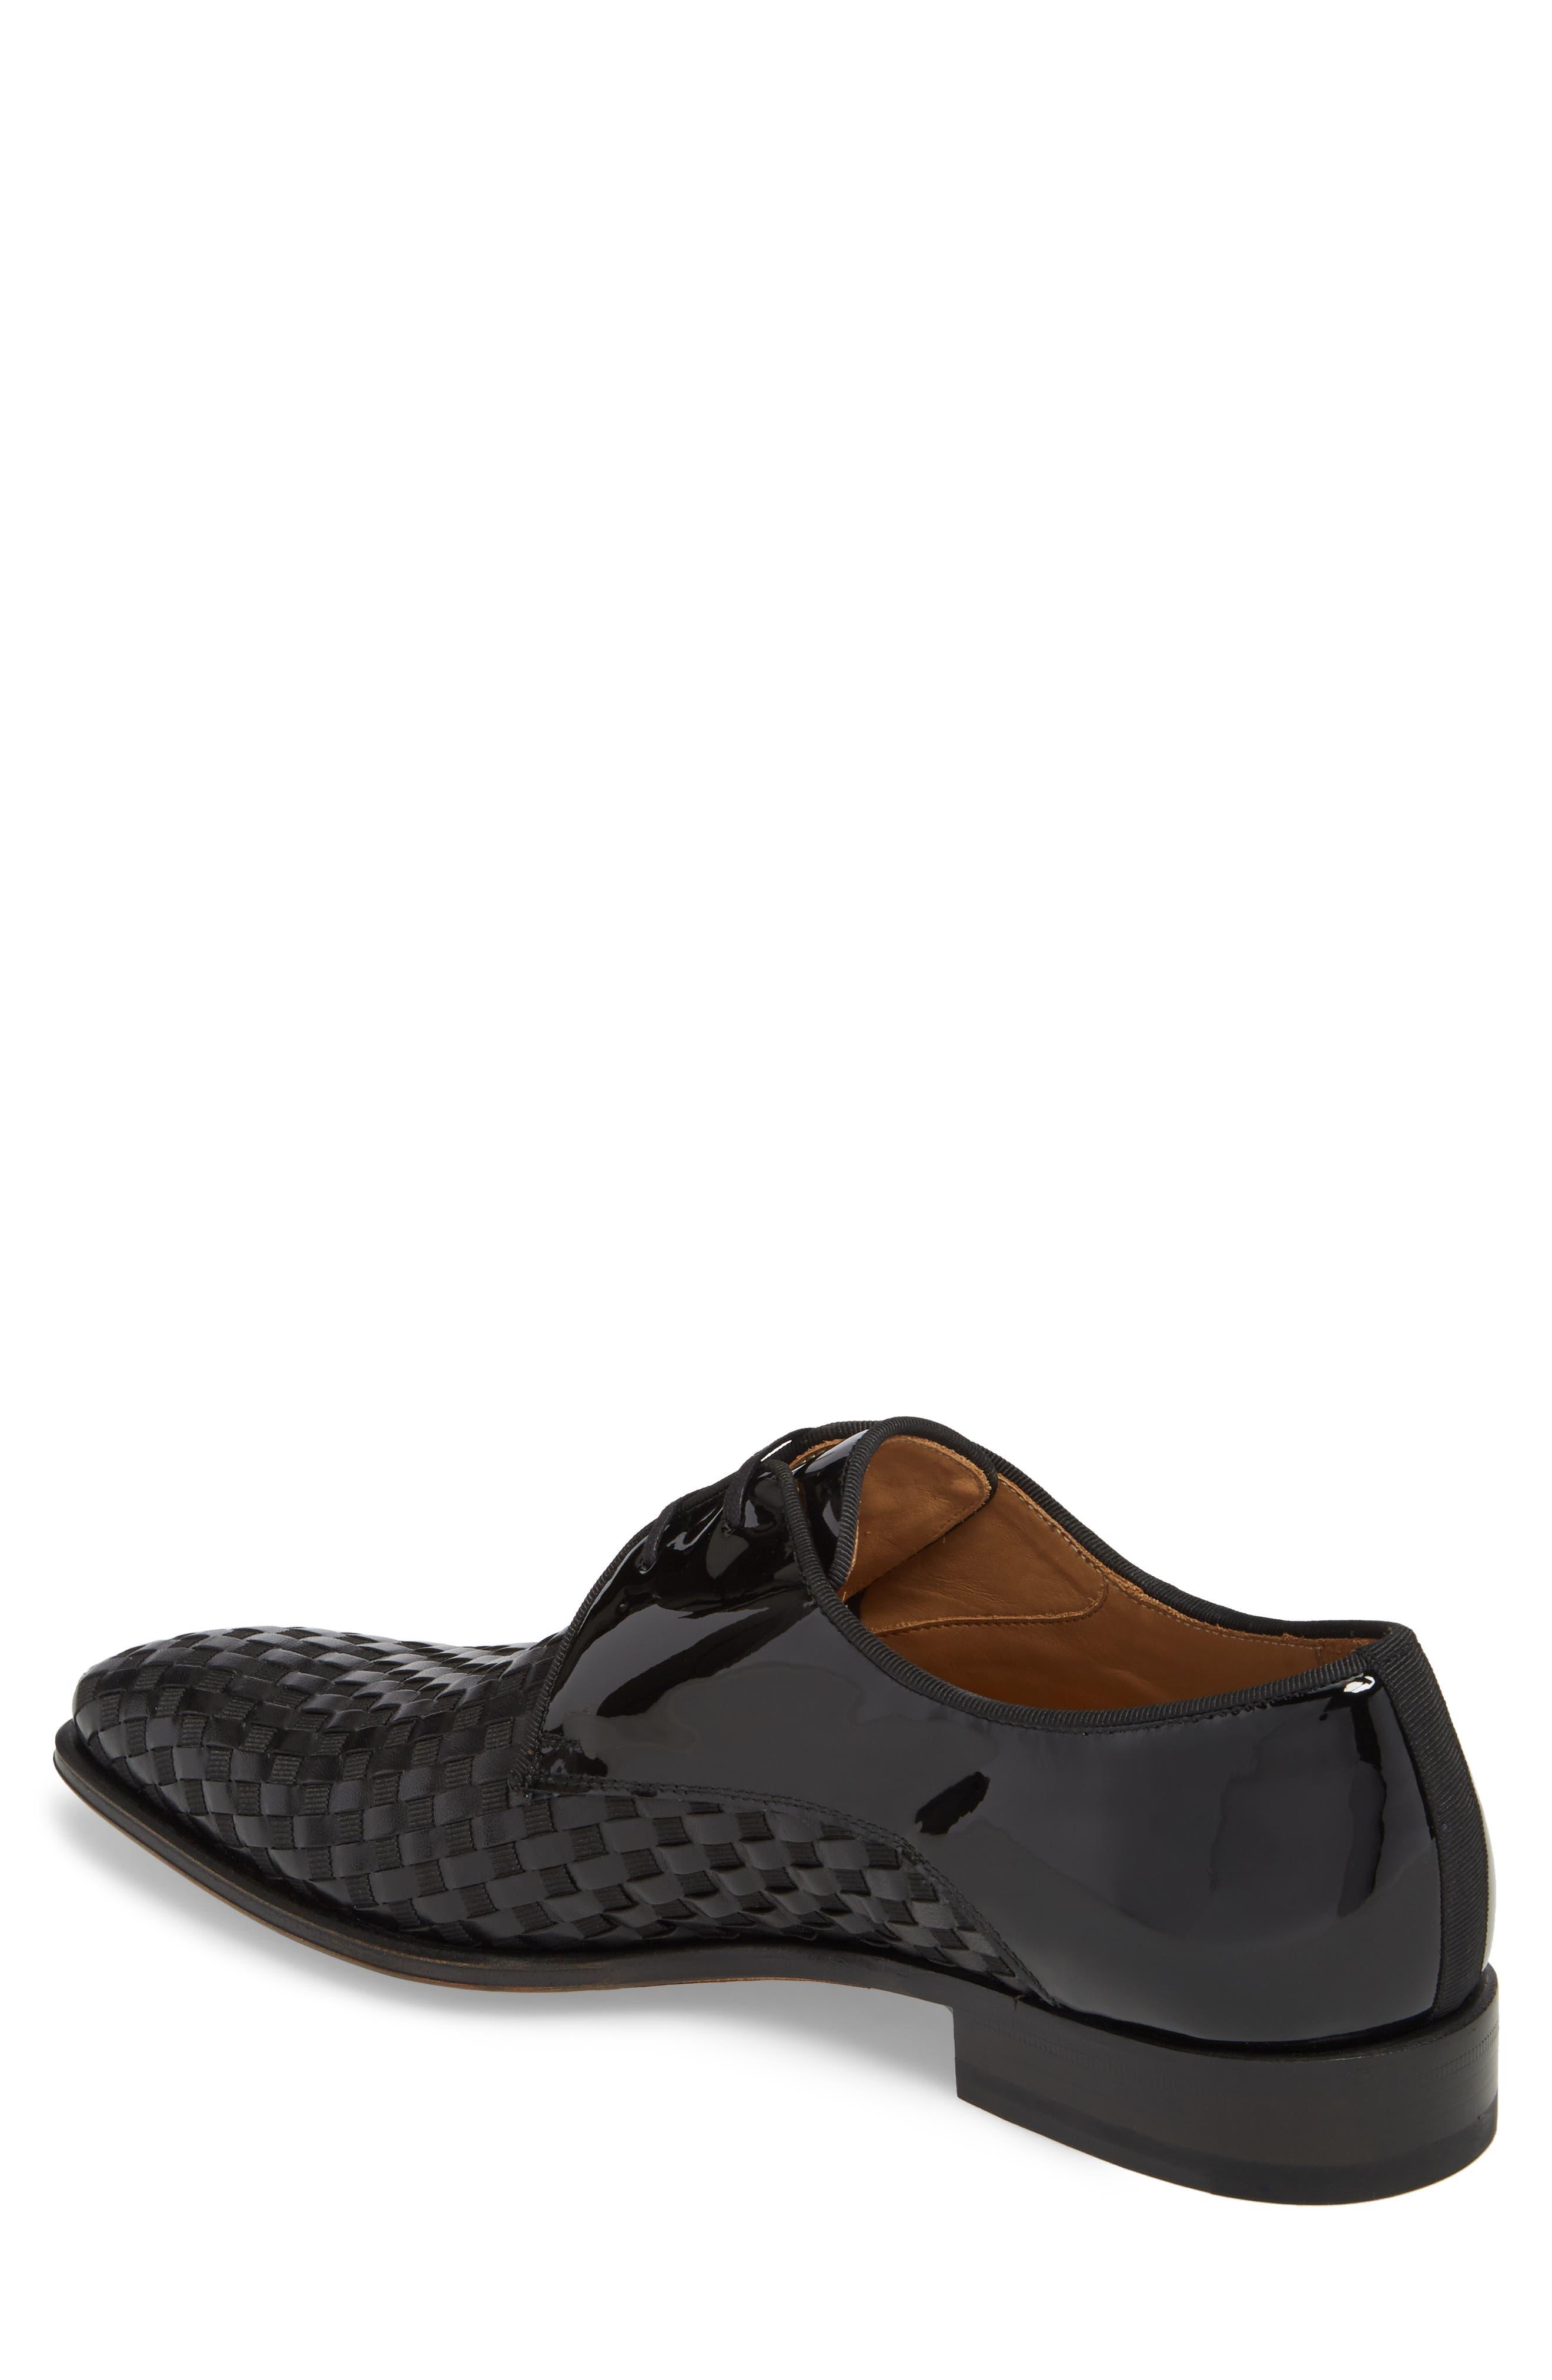 Sexto Plain Toe Derby,                             Alternate thumbnail 2, color,                             Black Leather